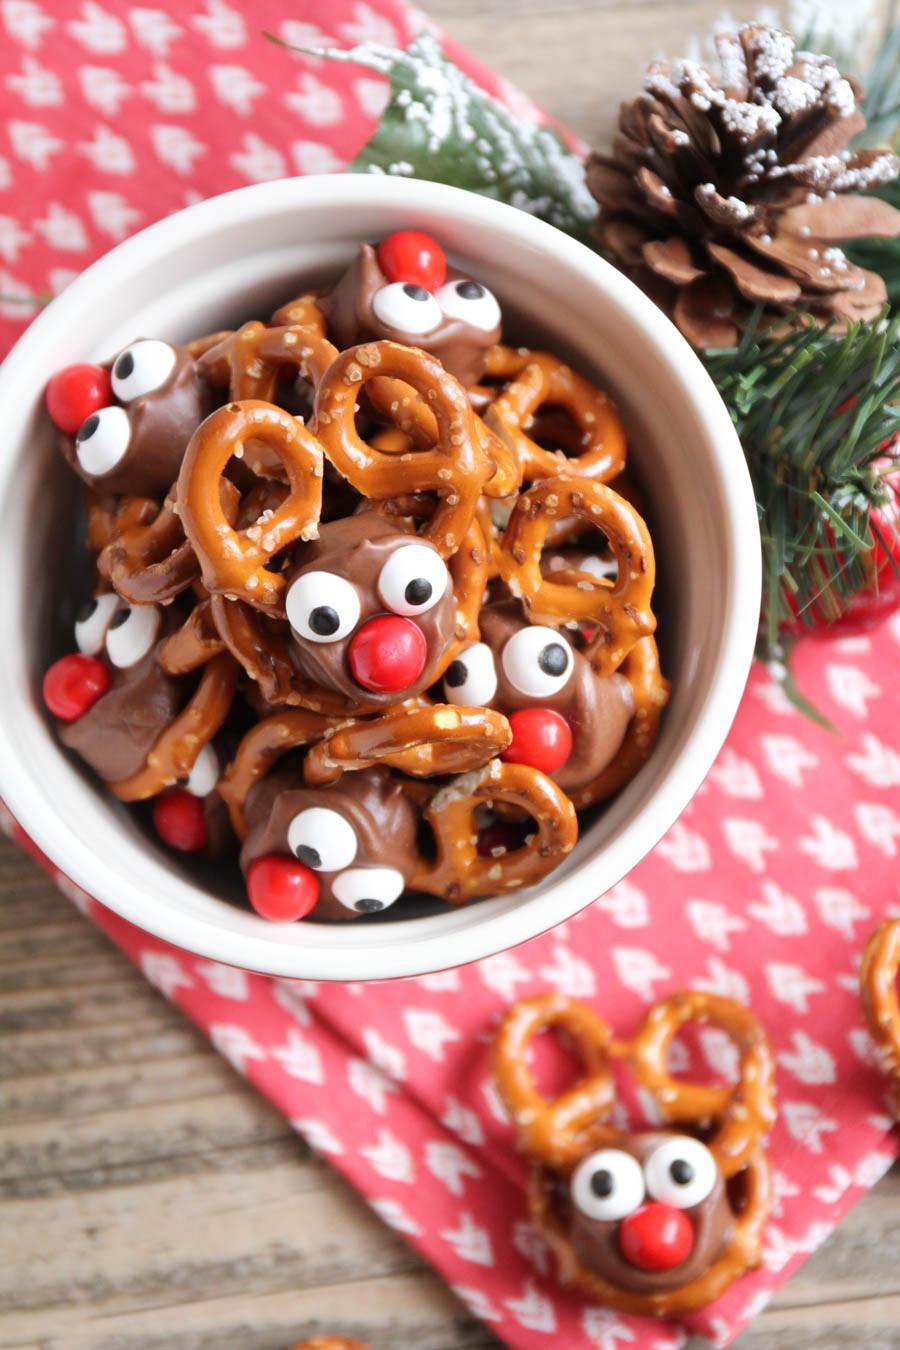 Cookies To Make For Christmas  25 Fun Christmas Treat Ideas – Fun Squared